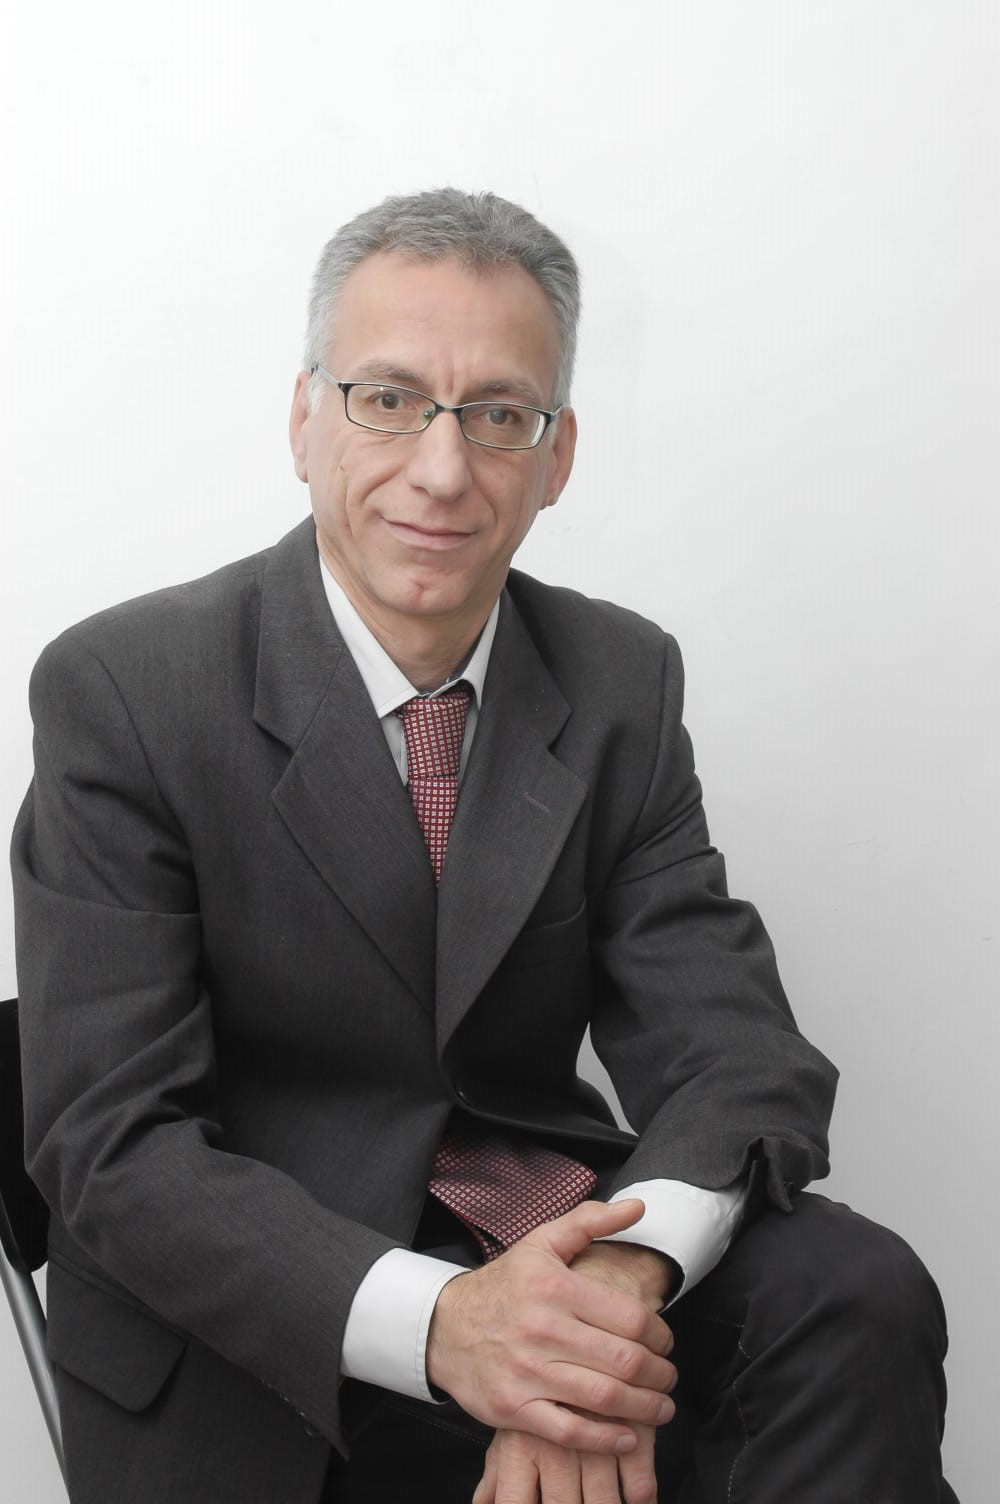 ALBERTO MONTORO